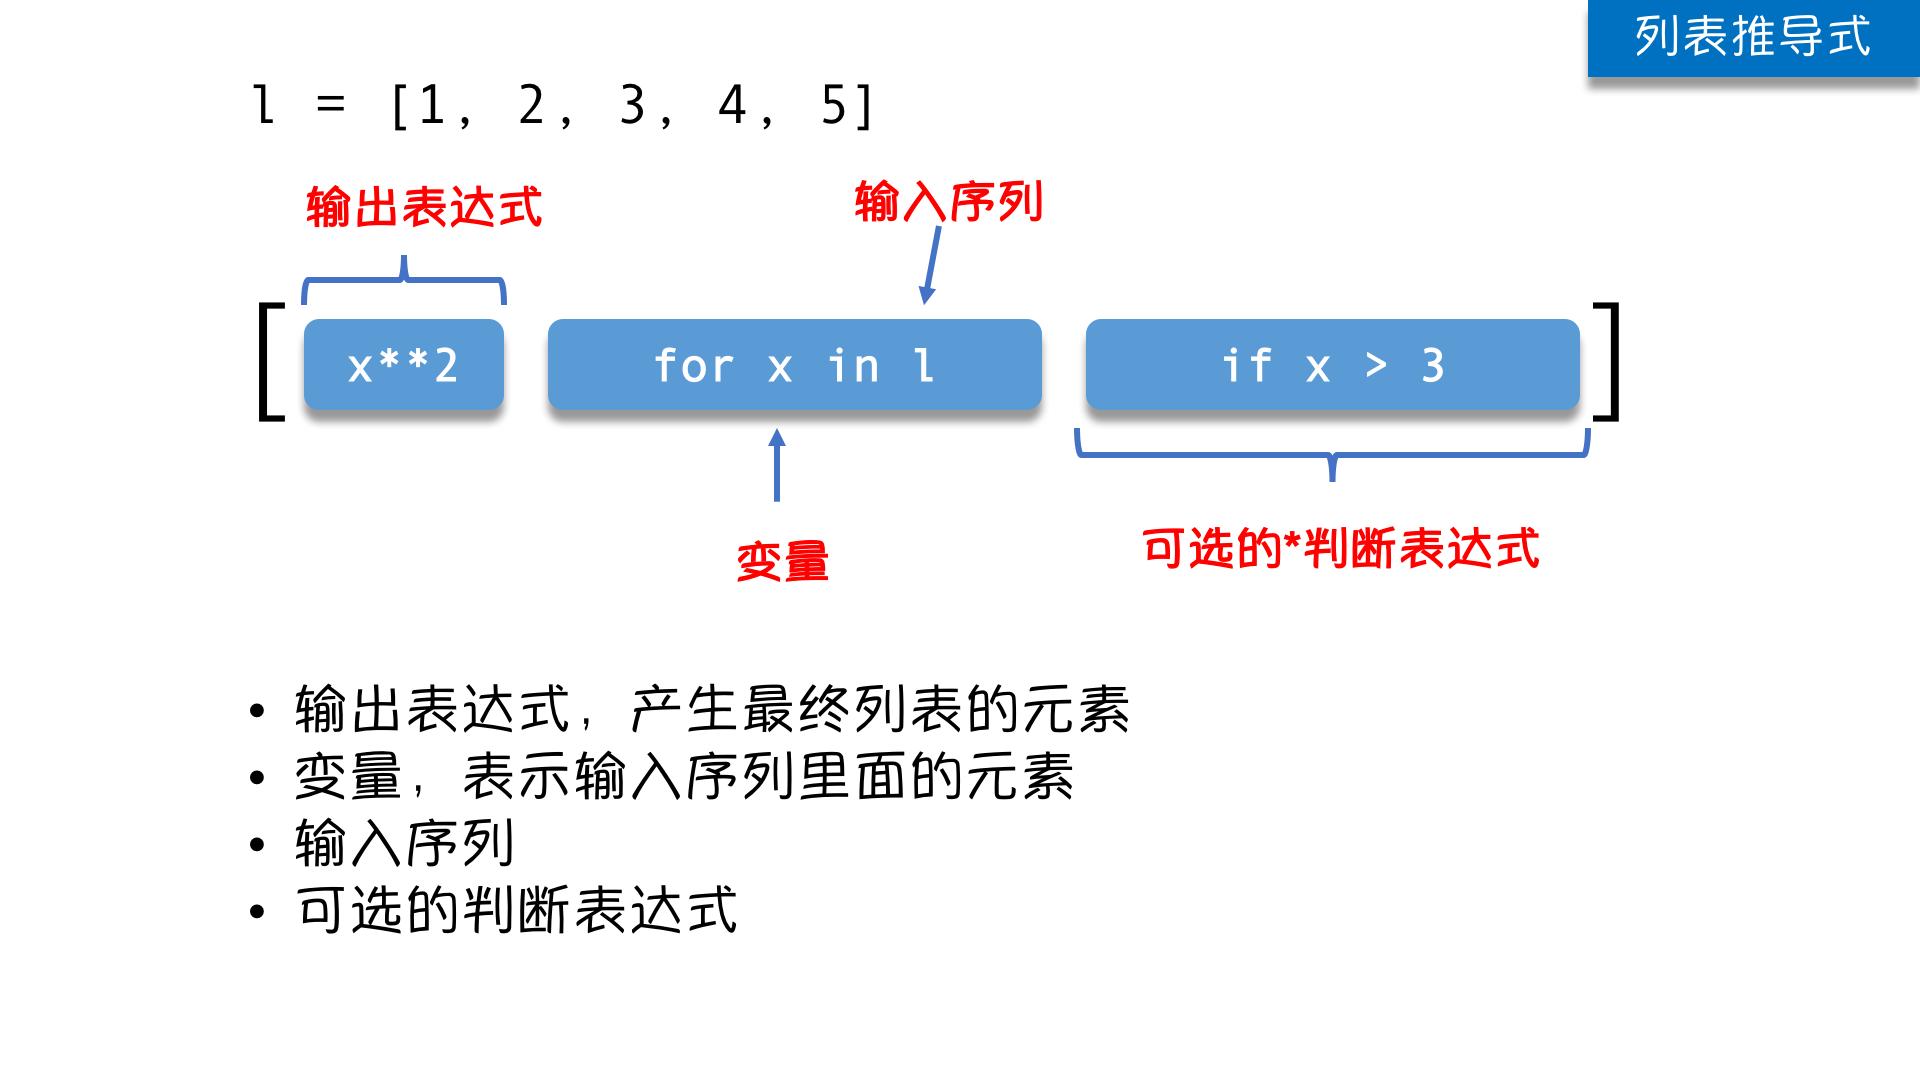 82c015a3c6e51ad4d128eeccda785a61.png